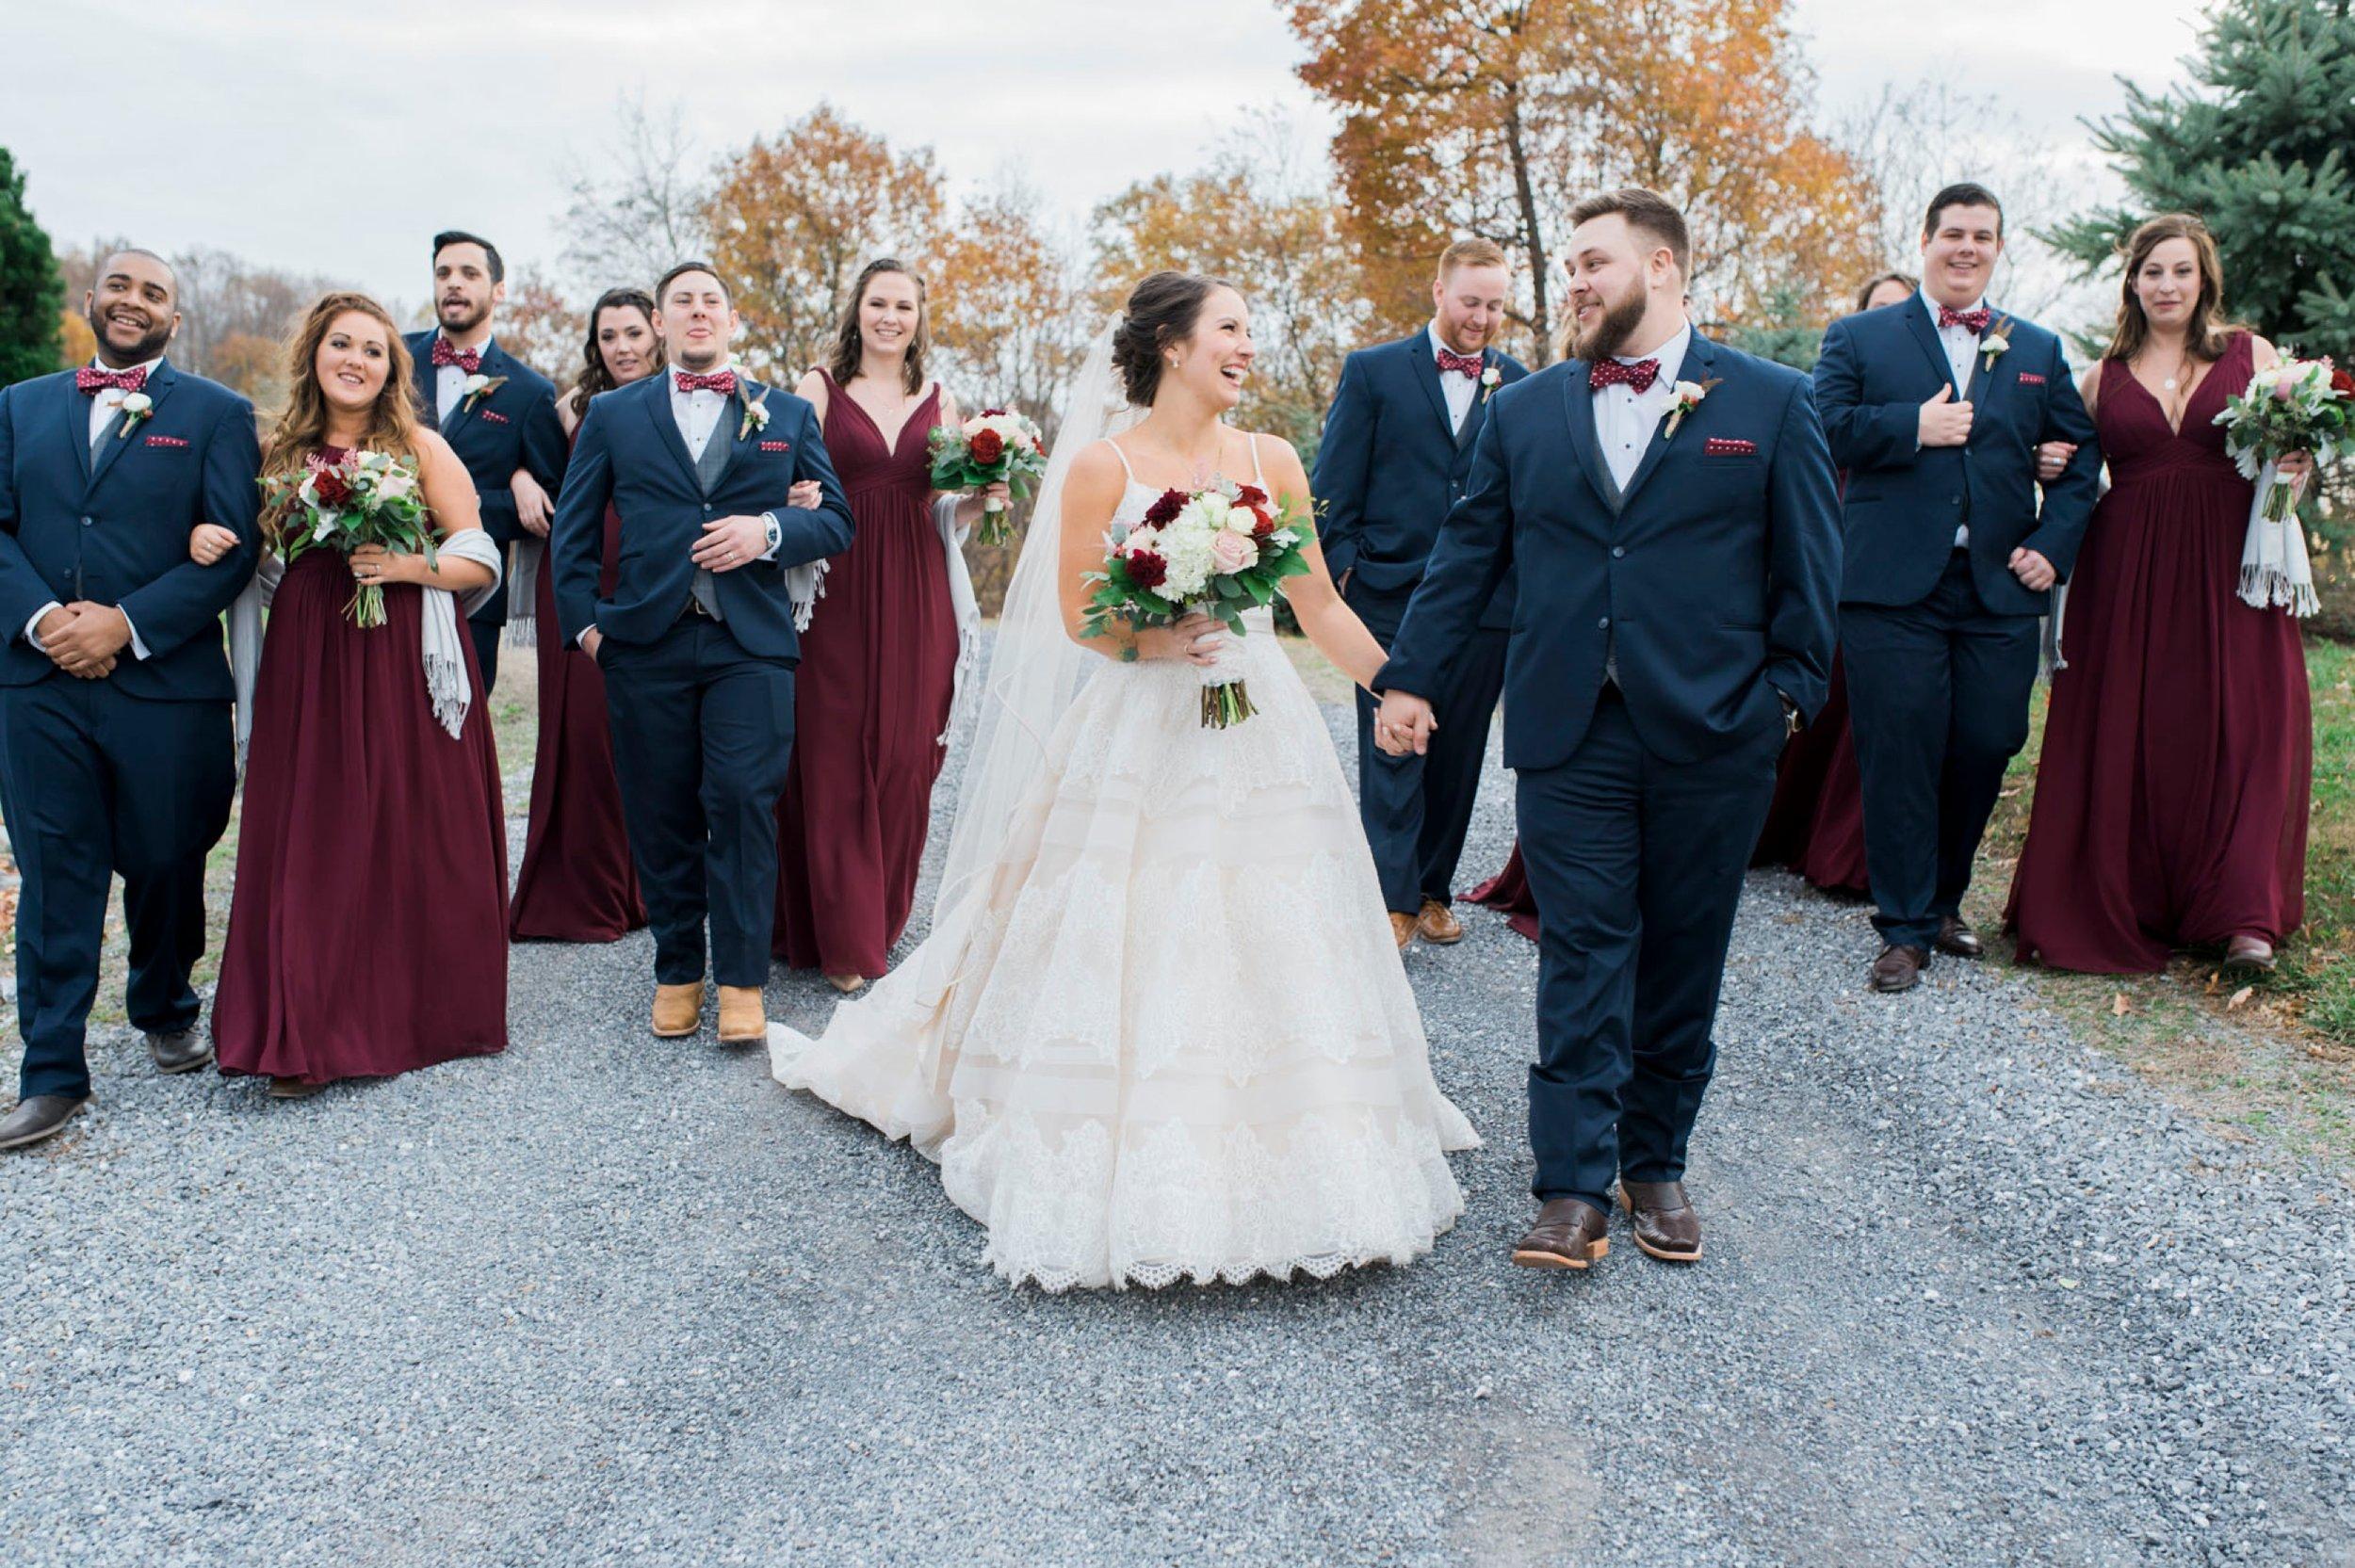 IrvineEstate_LexingtonVA_Wedding_FallWedding_VirginiaWeddingPhotographer 73.jpg